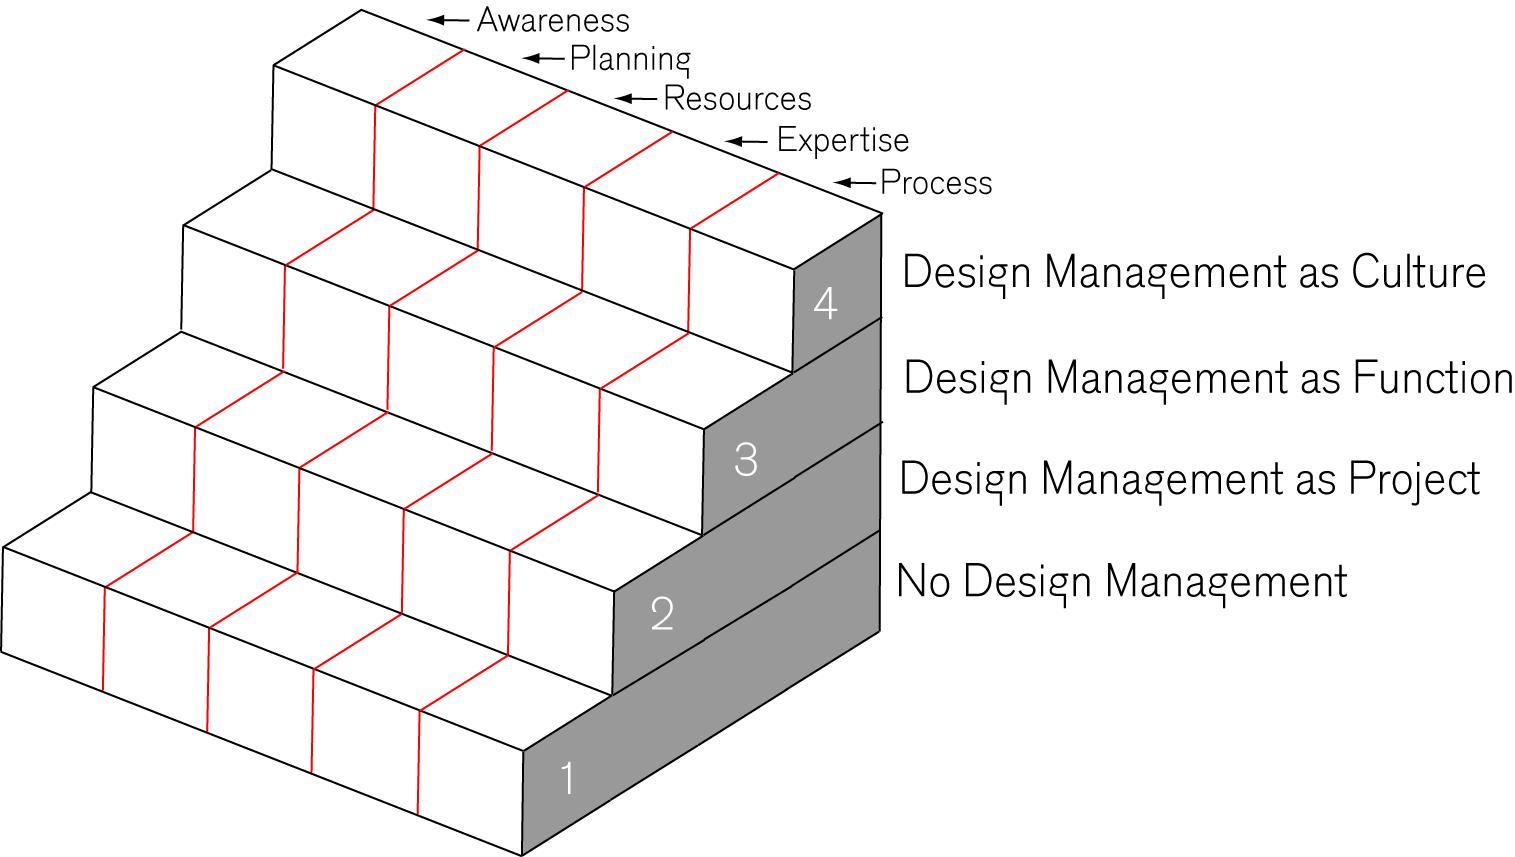 Design Management Staircase | savic